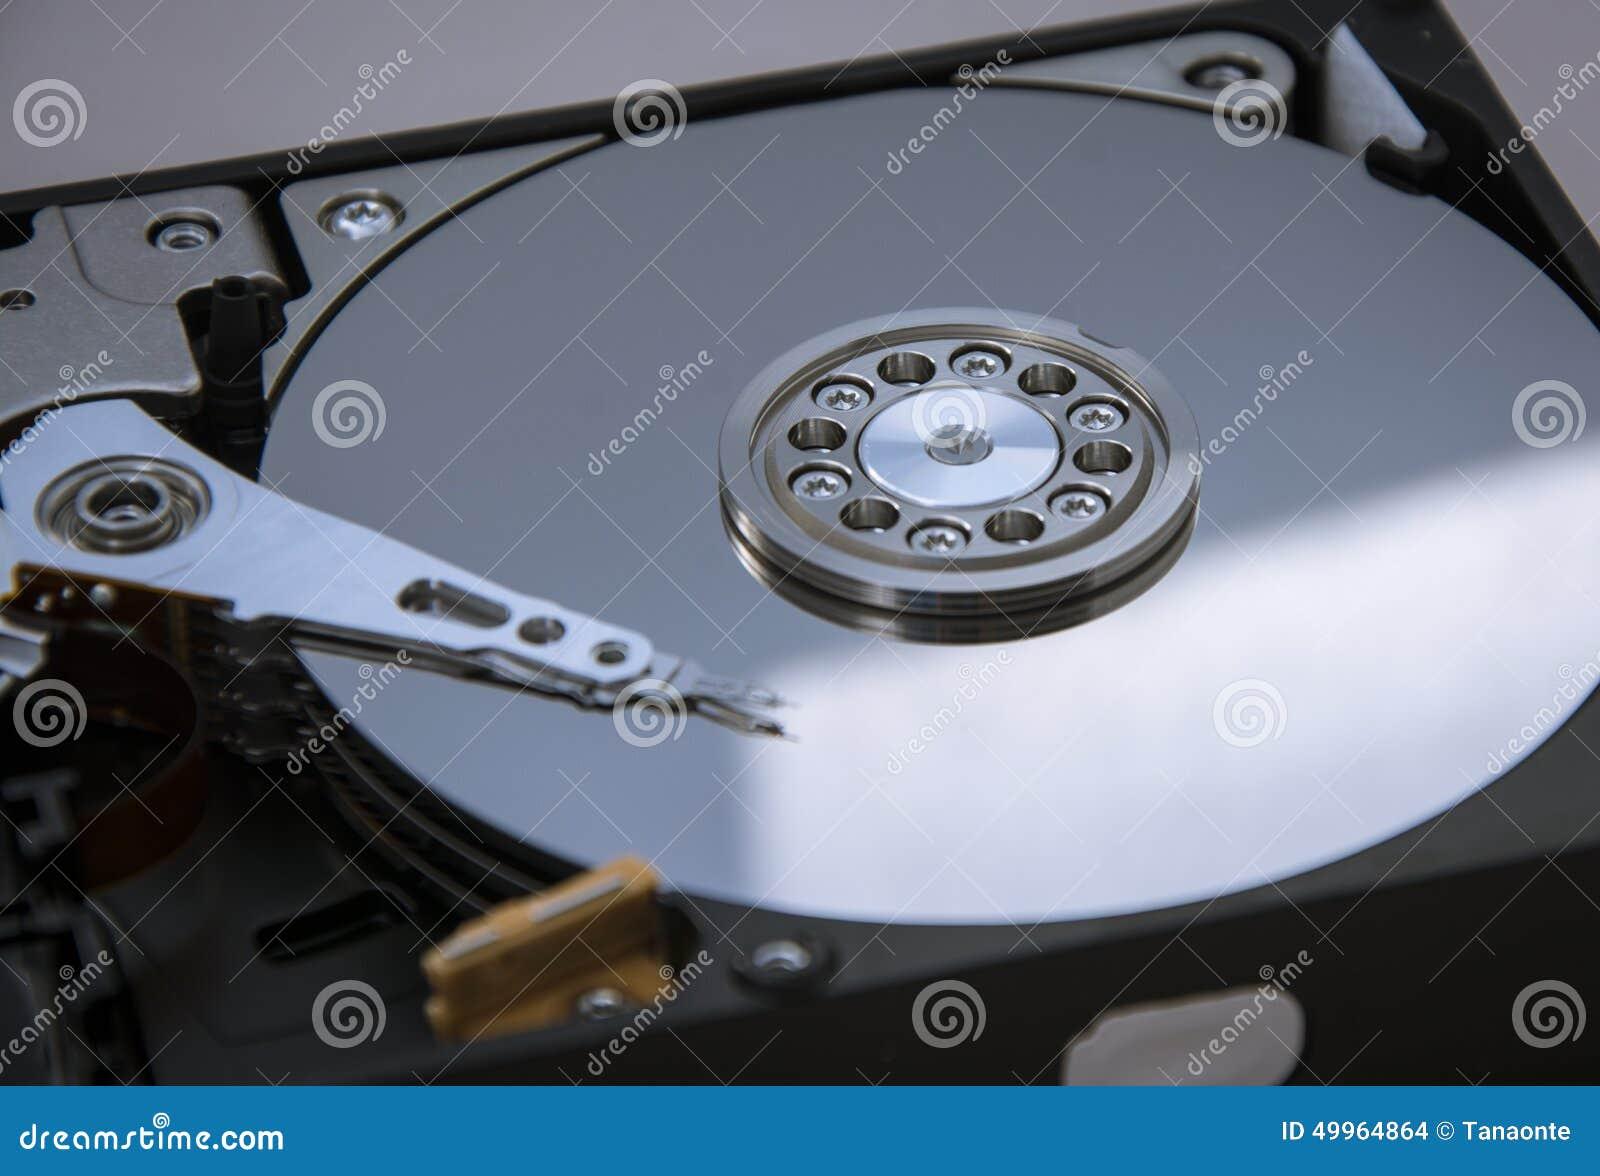 how to fix computer hard drive